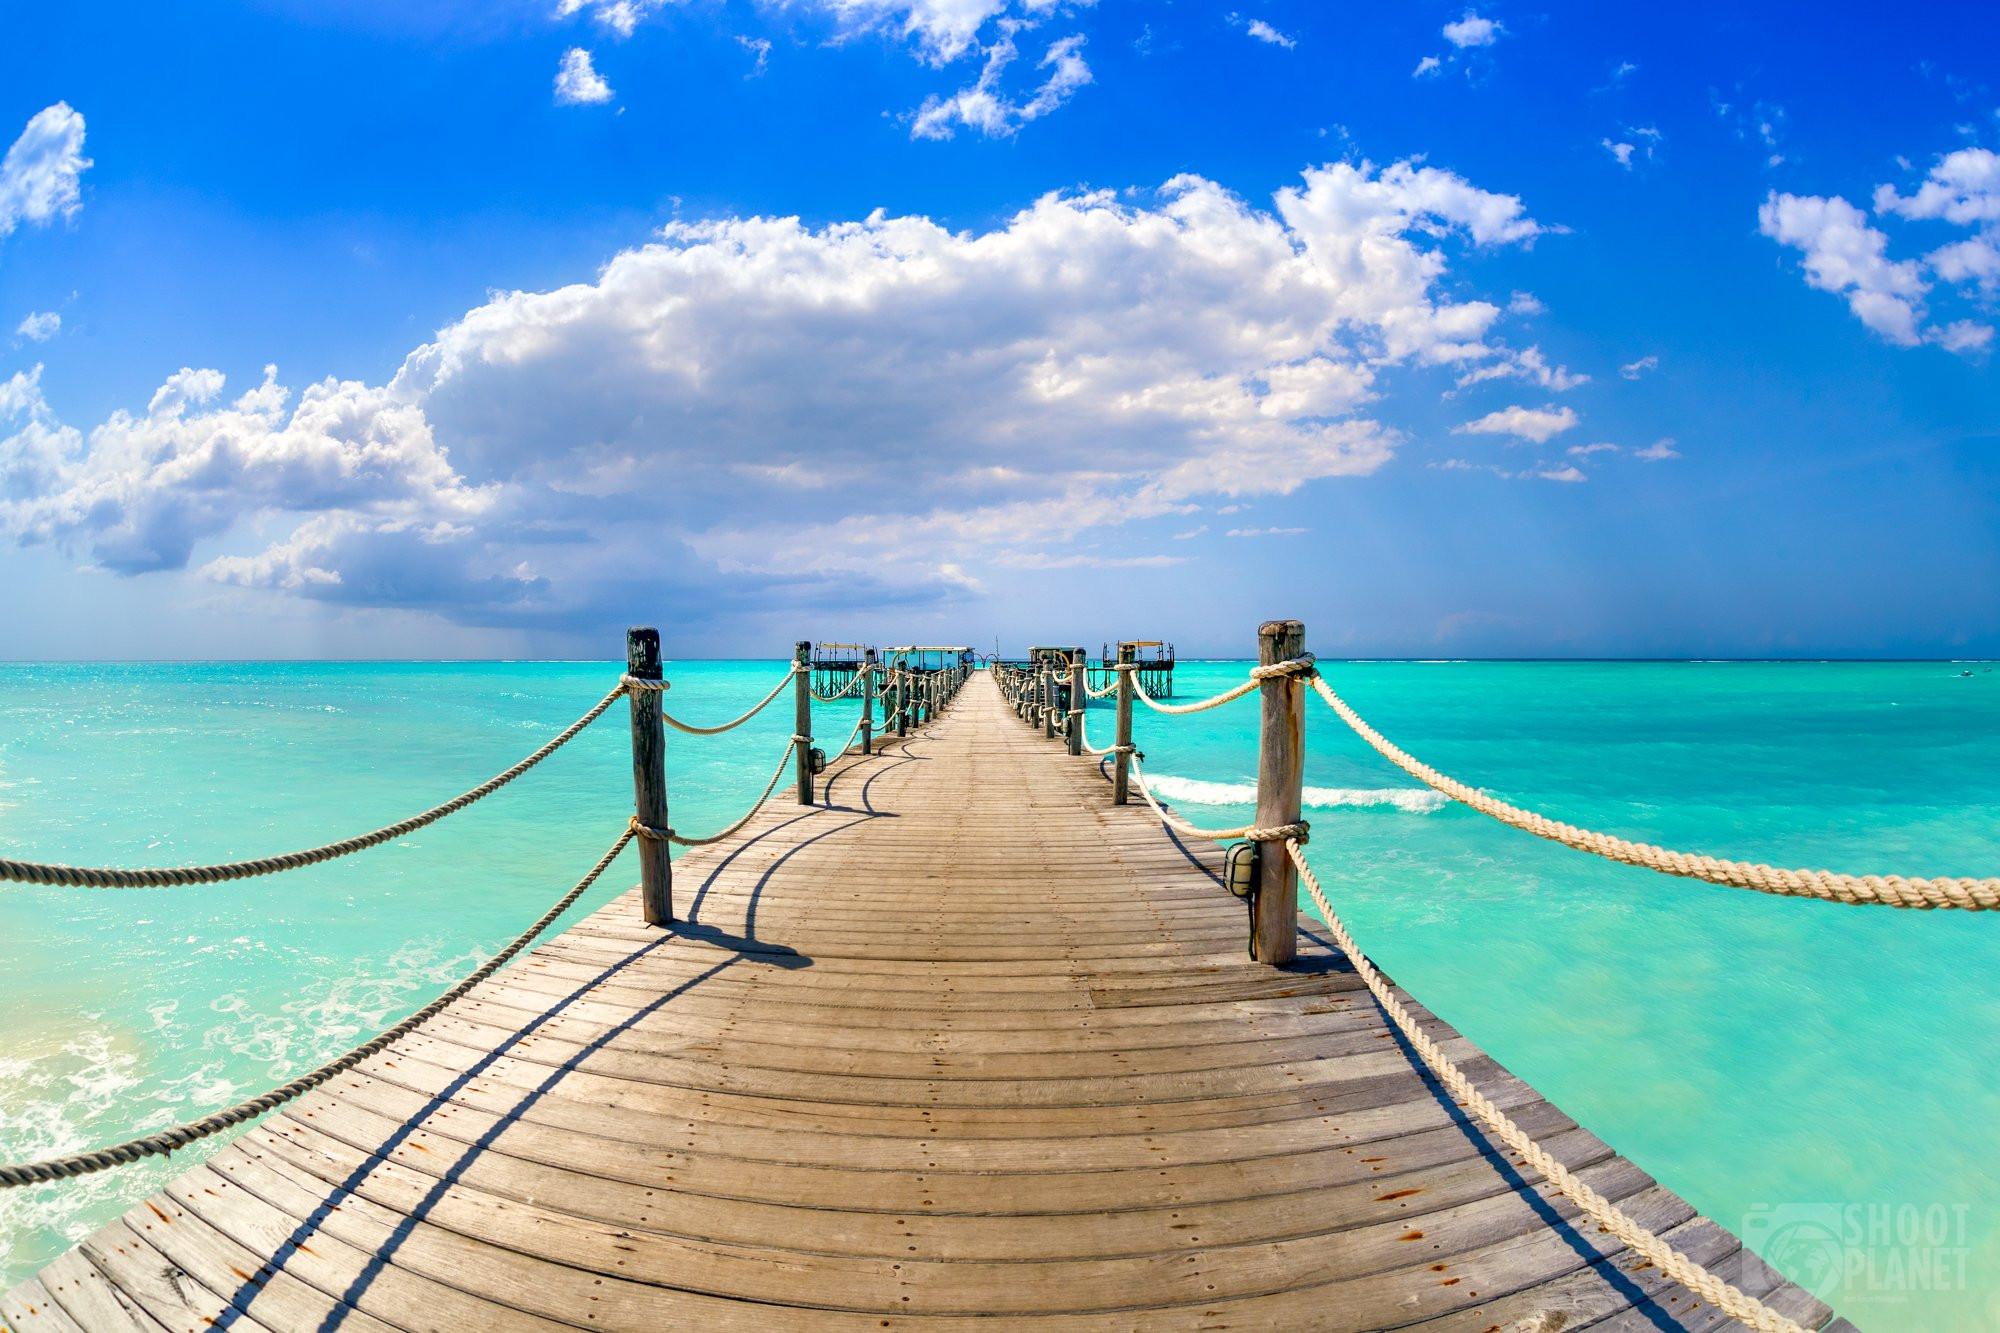 Infinite Pier near Nungwi beach, Zanzibar Tanzania